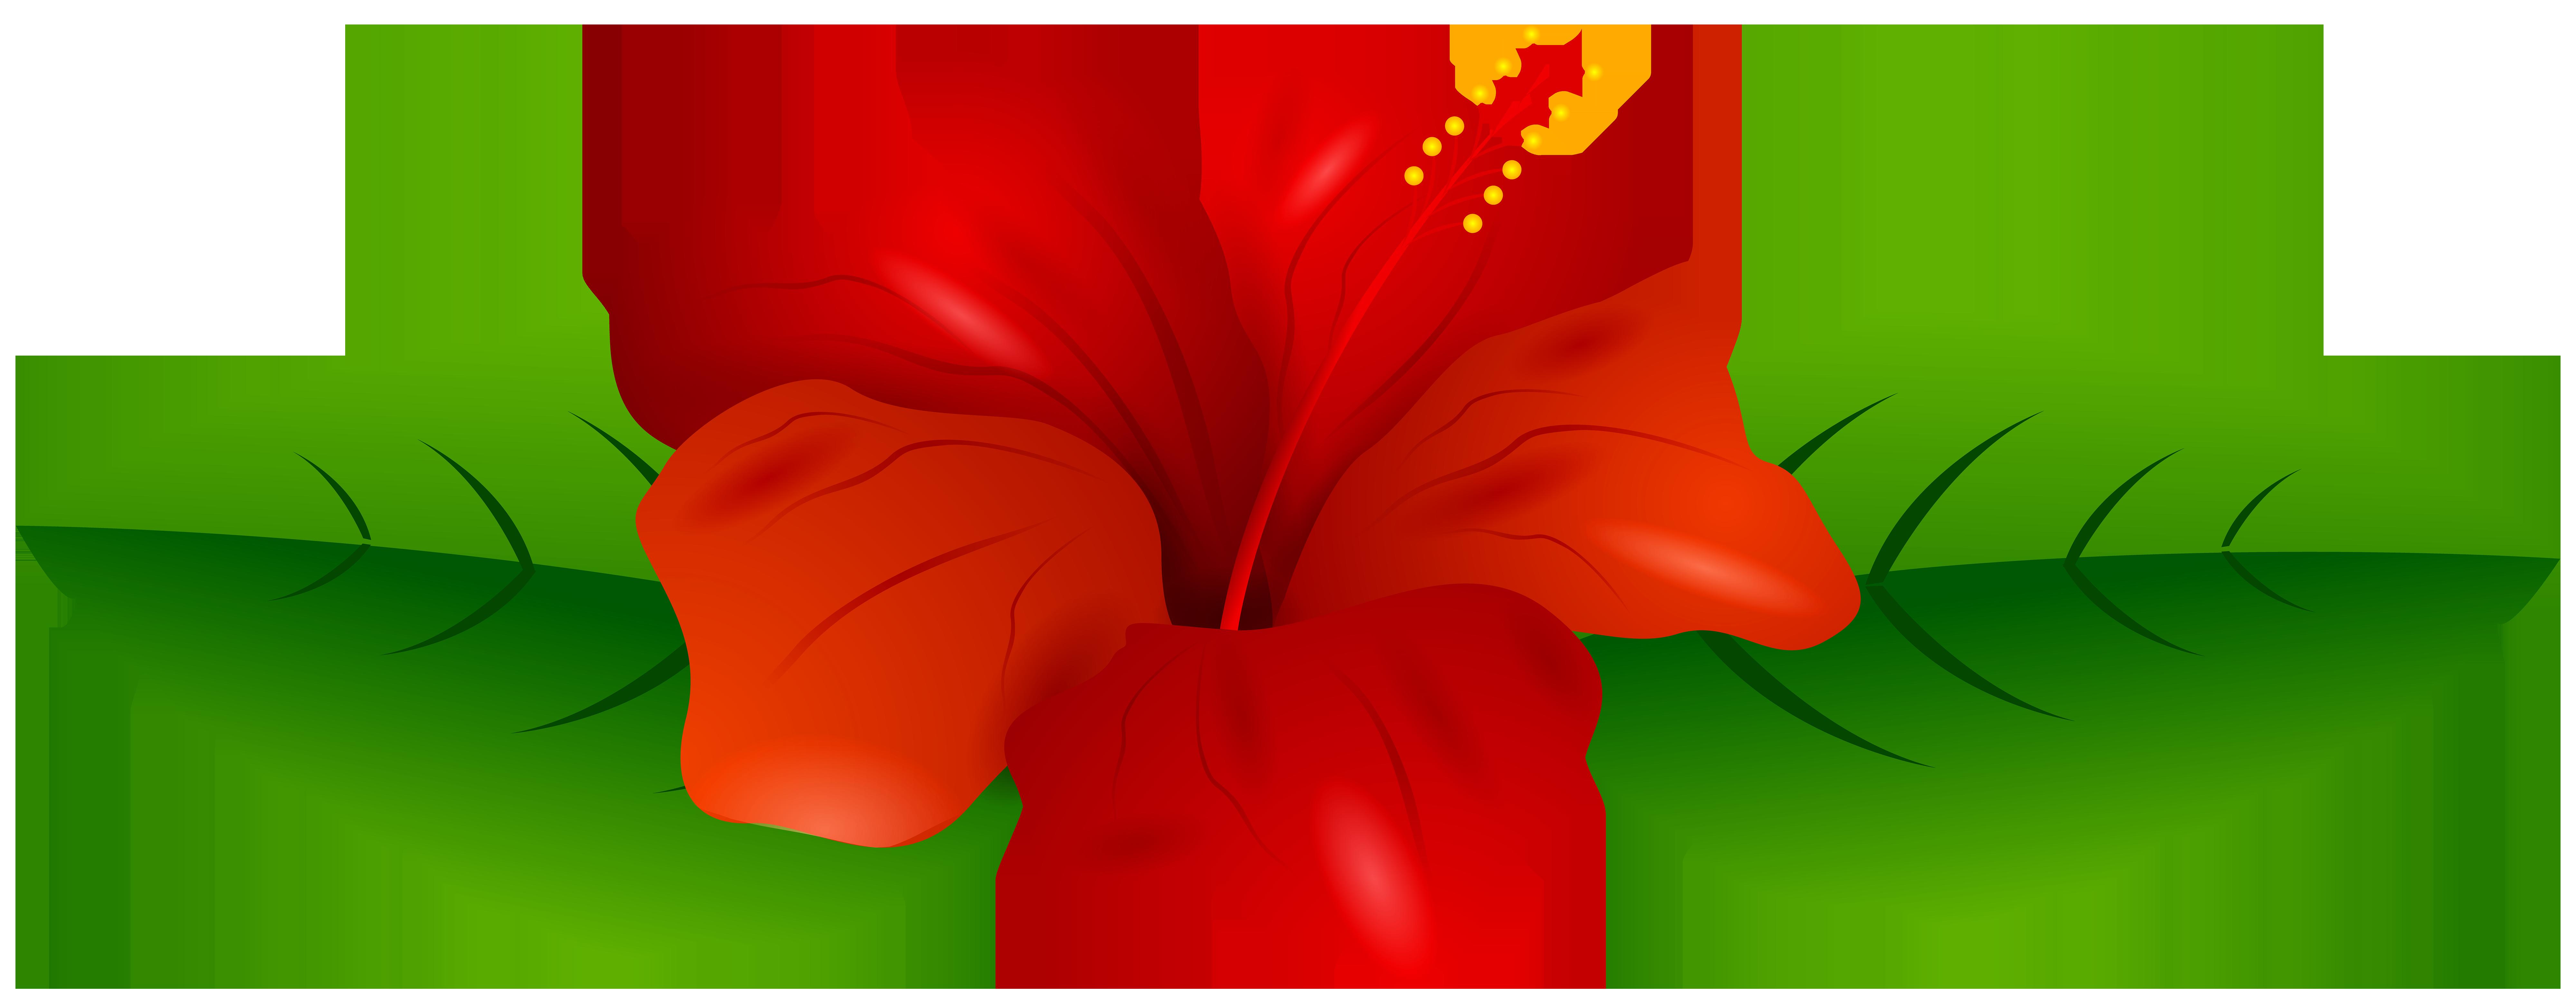 8000x3111 Red Hibiscus Transparent Png Clip Art Imageu200b Gallery